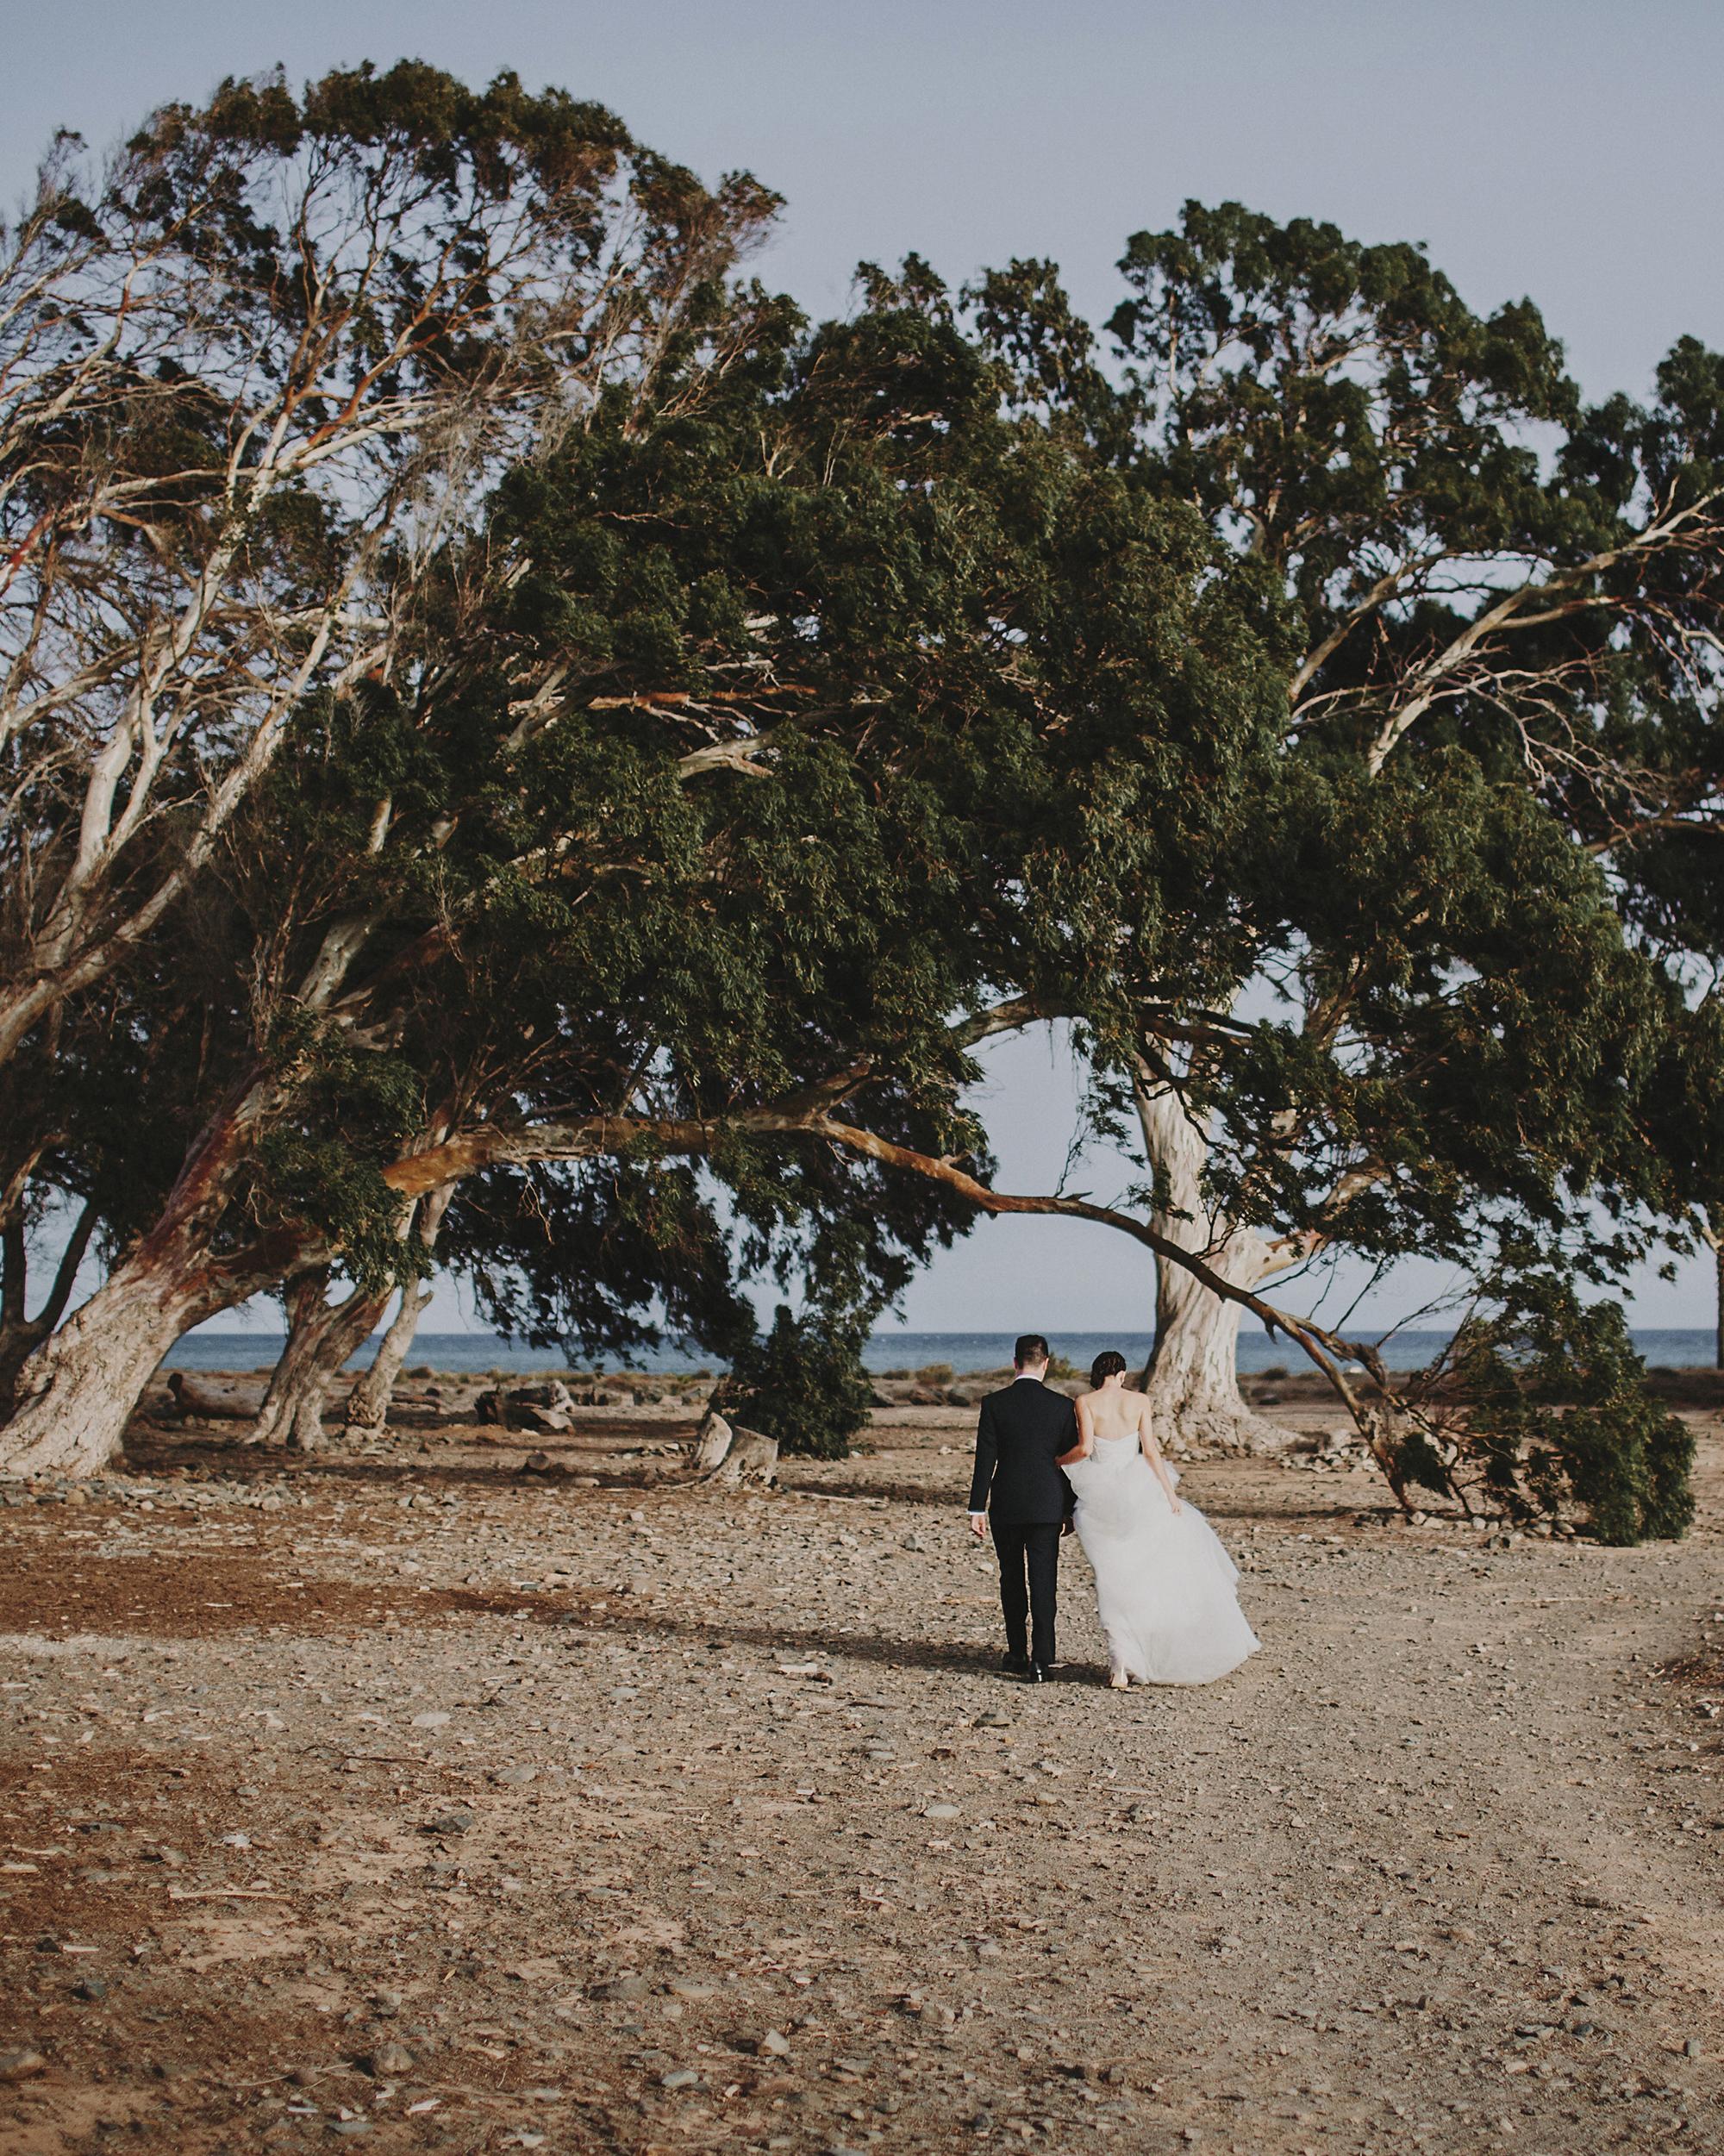 tamara-brett-wedding-couple-0832-s112120-0915.jpg